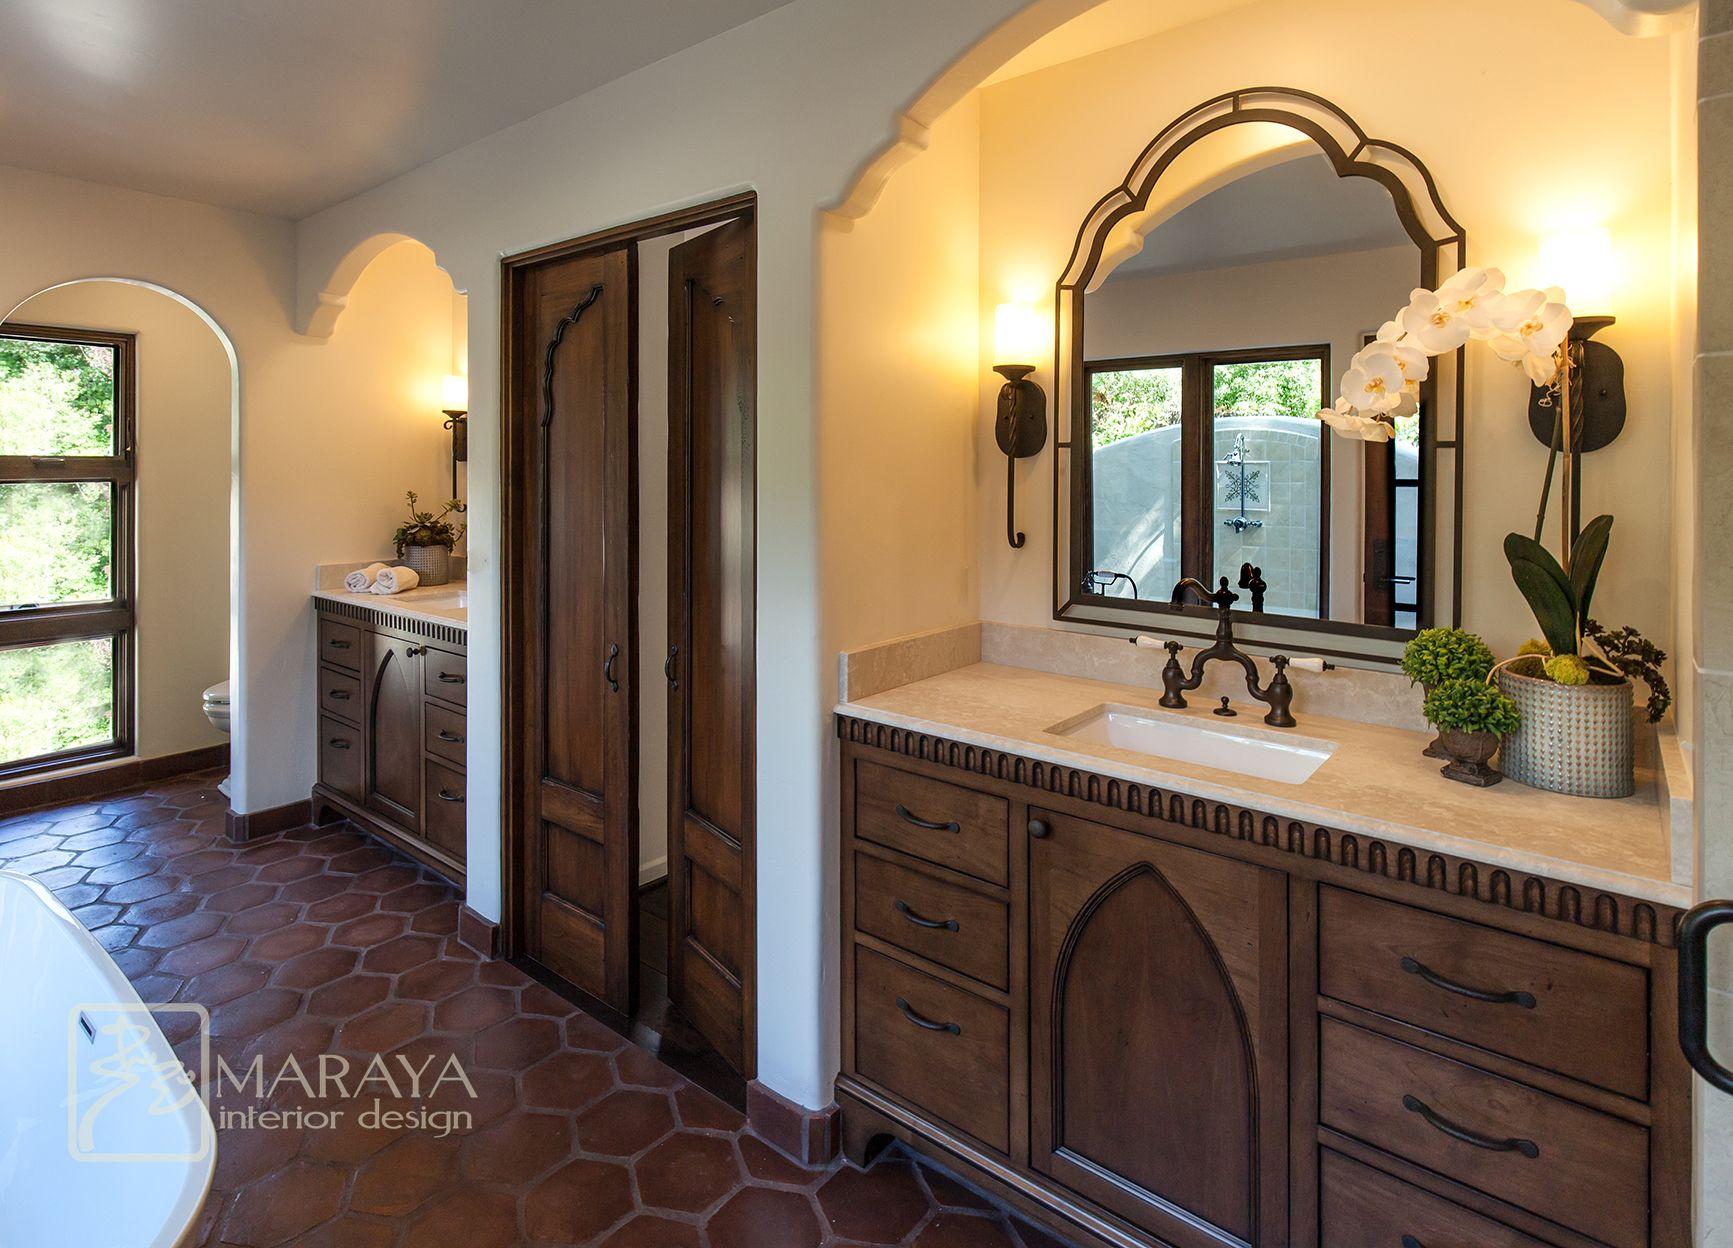 Maraya Interior Design Spanish and Indian Bath | Amazing ...